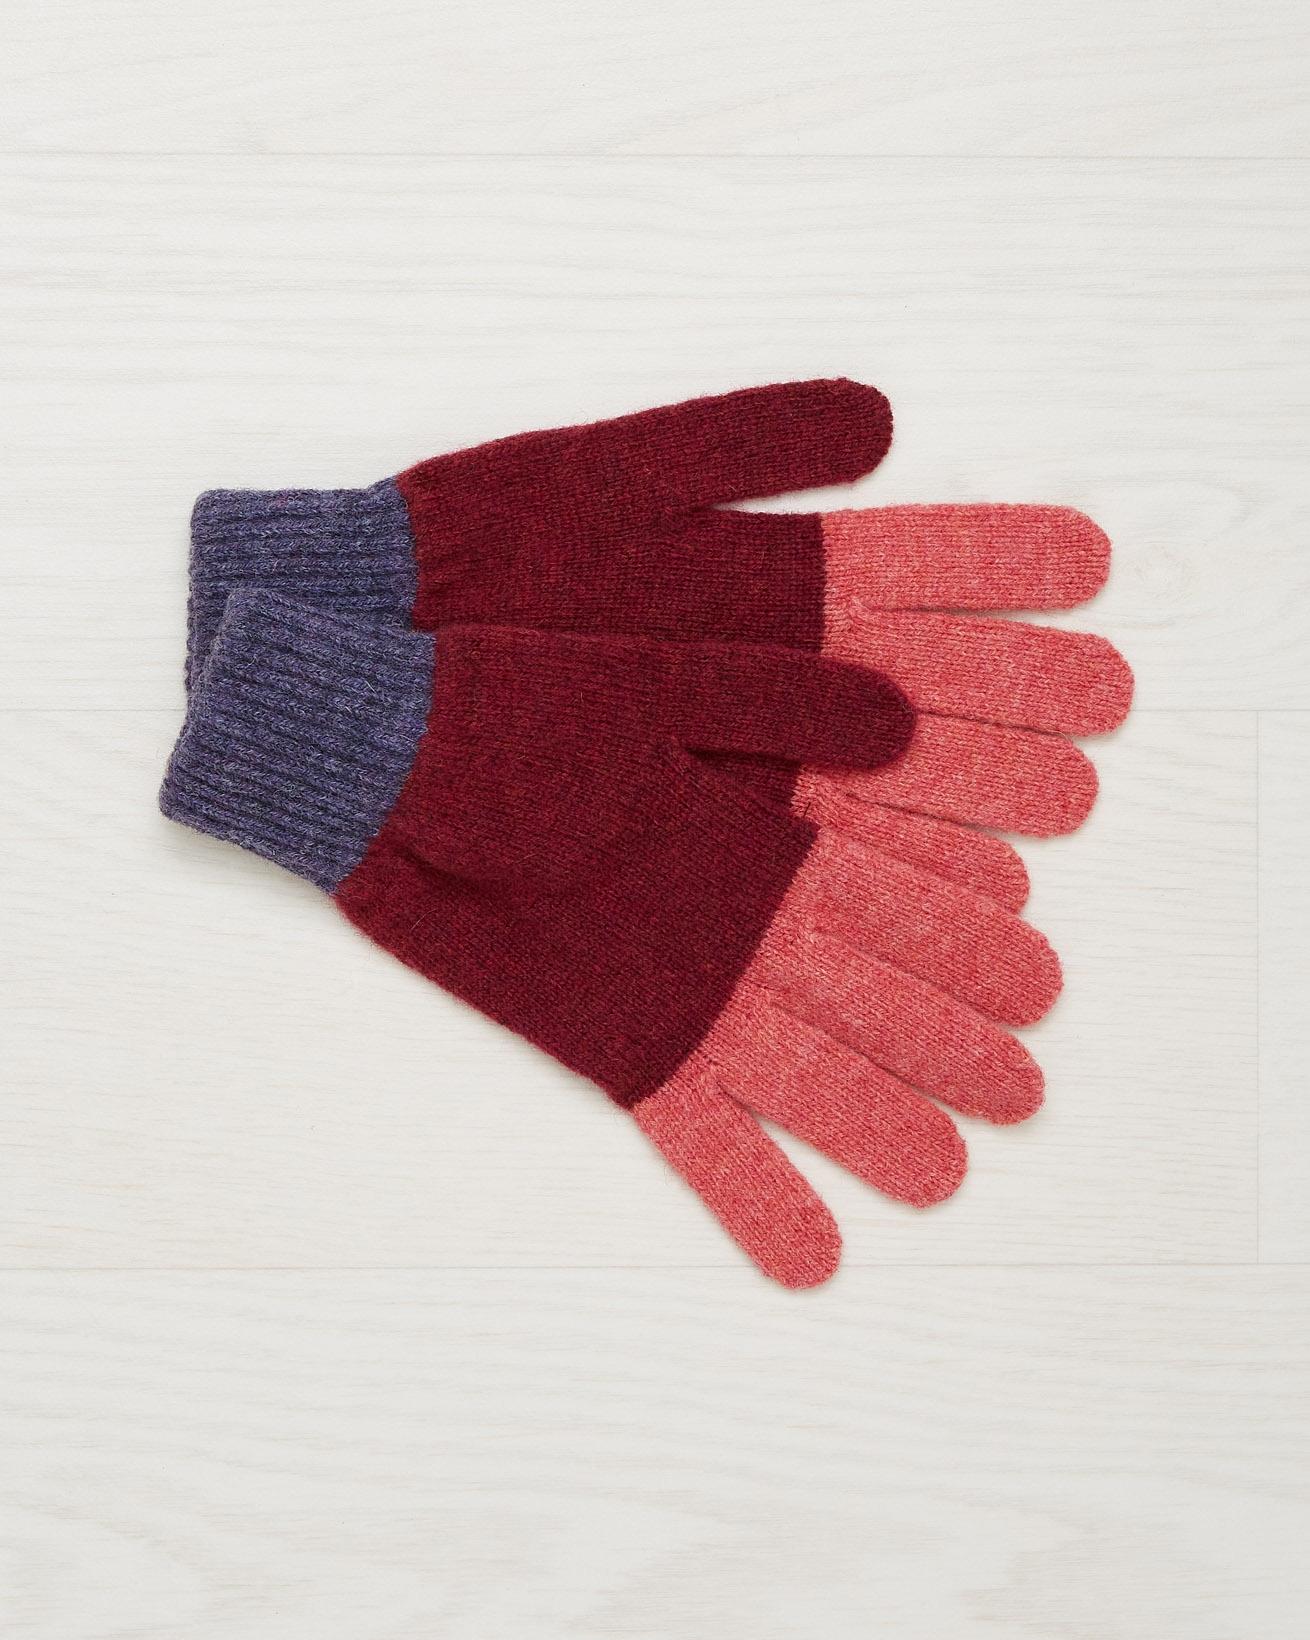 Shetland Wool Gloves - Claret - One Size - 2542